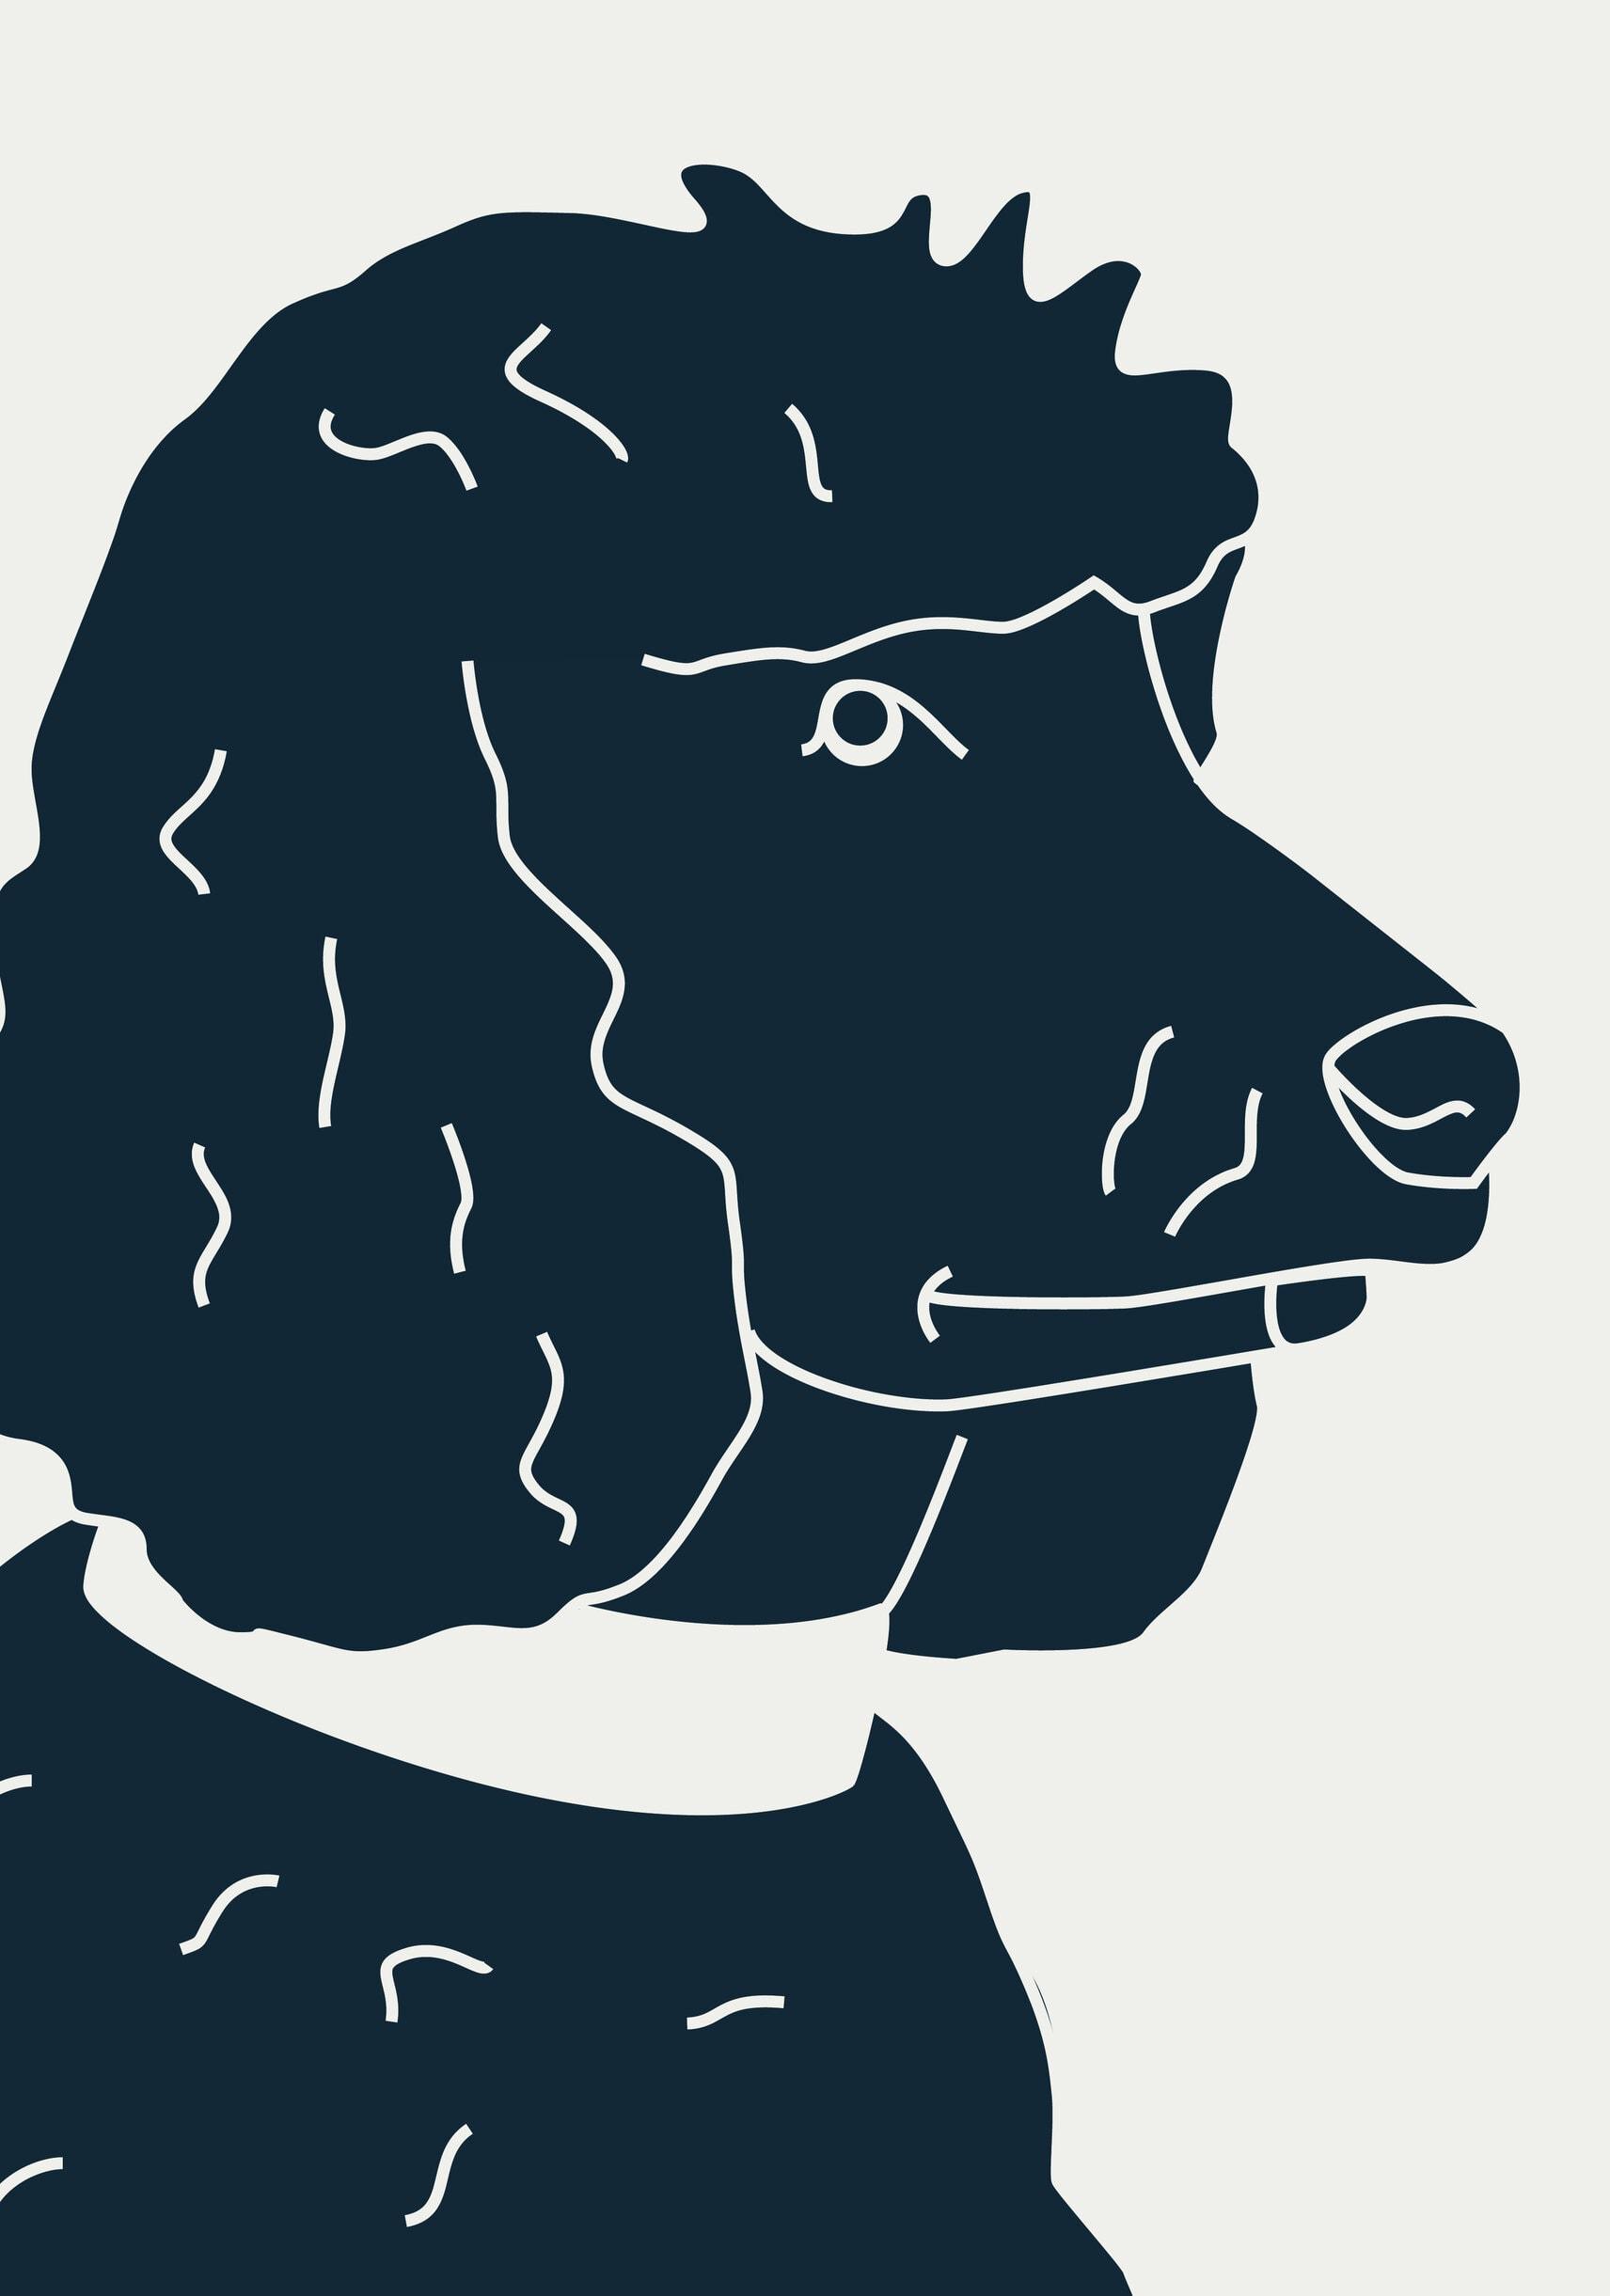 Pudel, Bürohund, office dog, KittoKatsu, Herr Ando, halloherrando